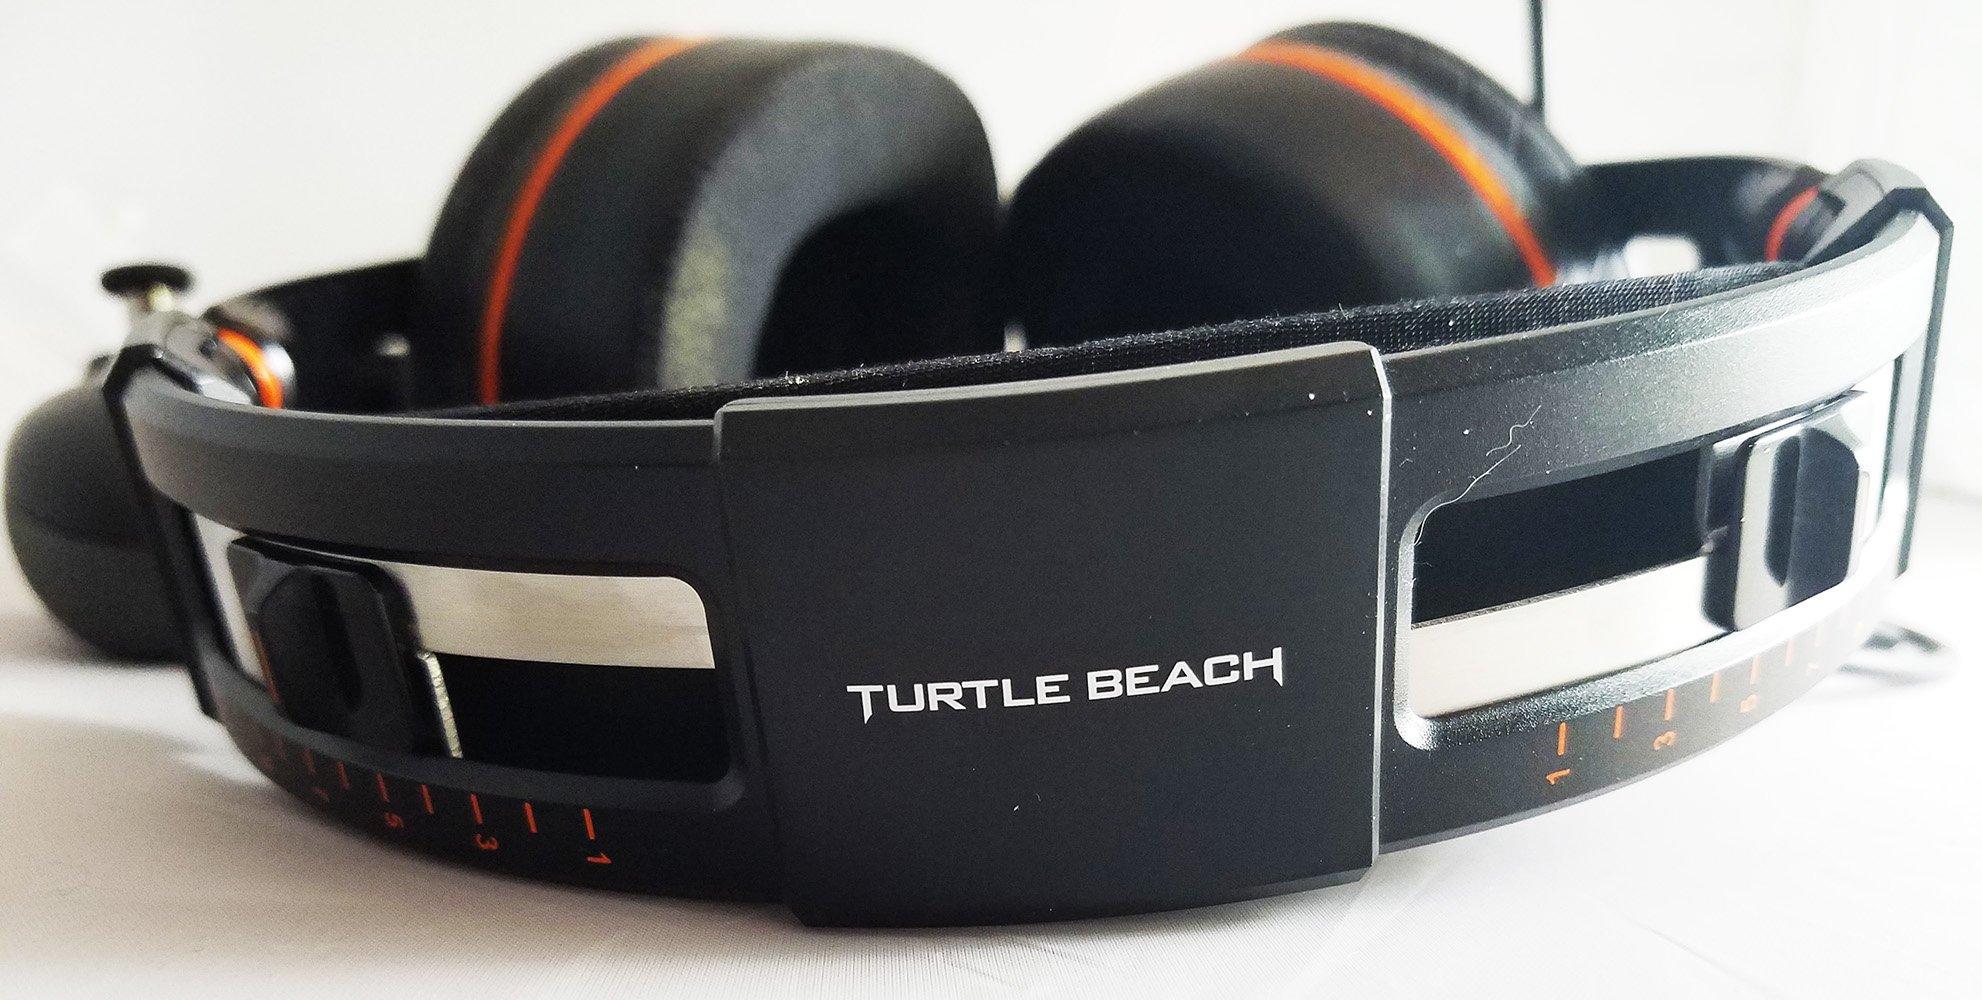 Turtle Beach Elite Pro tension control